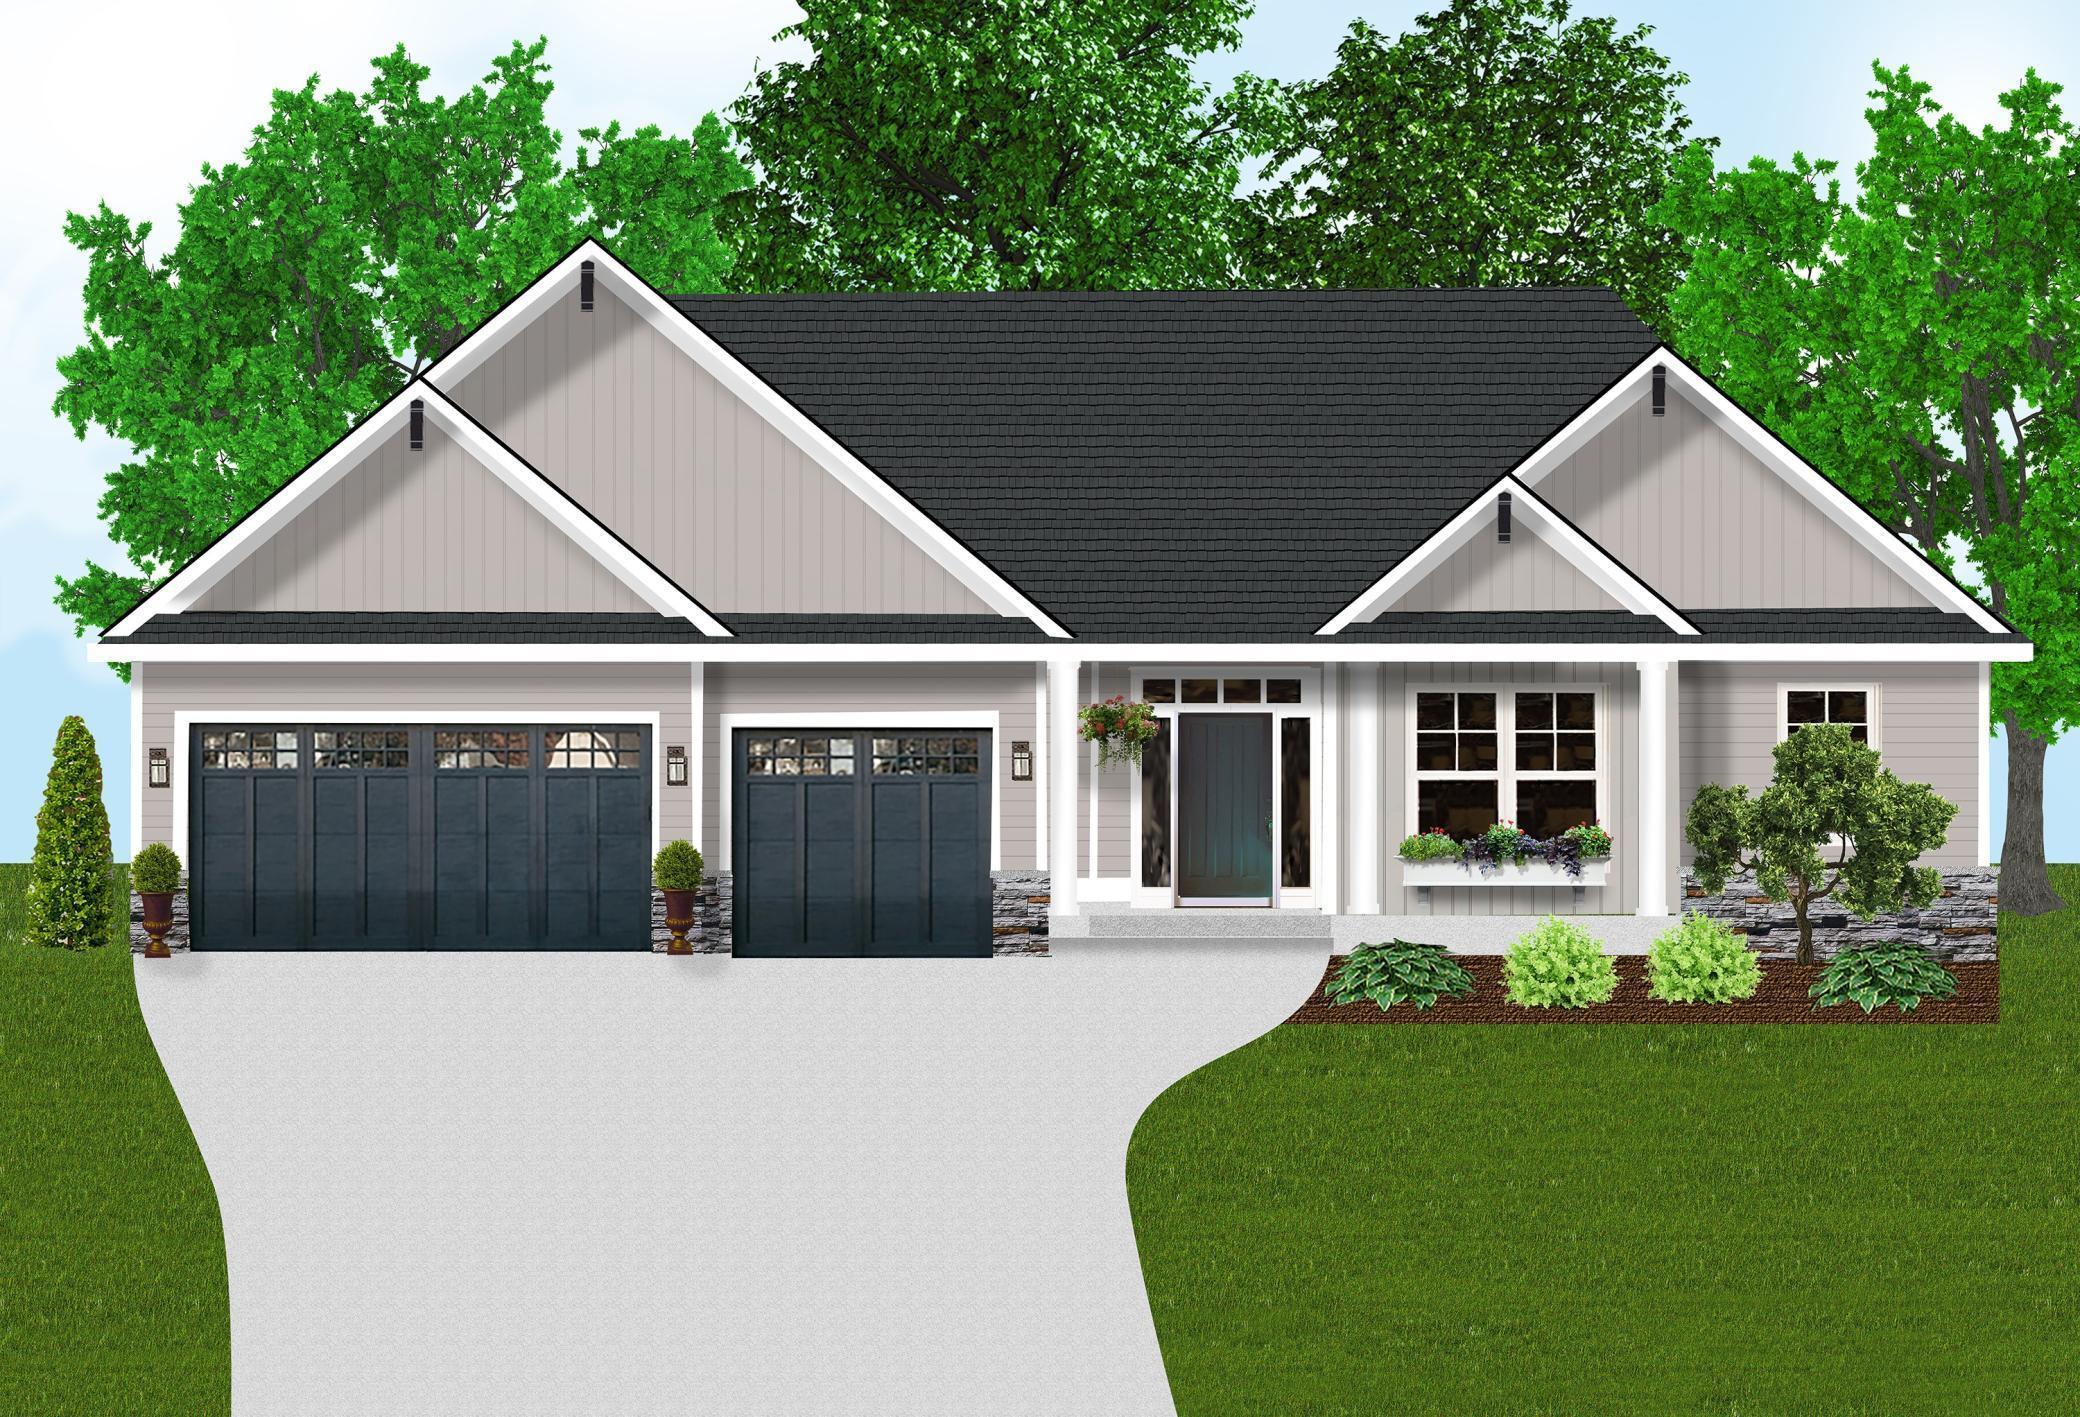 14990 142nd Avenue N Property Photo - Dayton, MN real estate listing